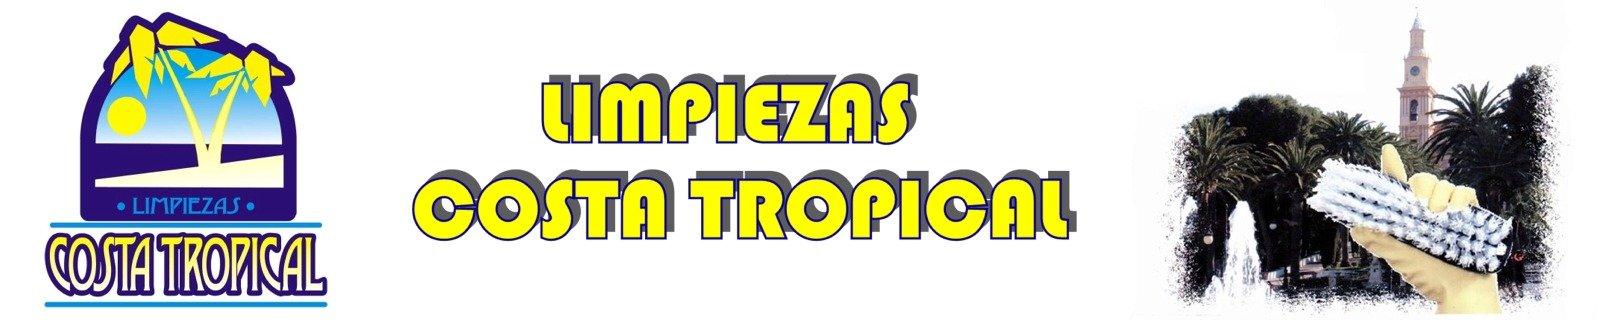 Limpiezas Costa Tropical, limpiezas costa tropical en motril, limpiezas en motril, limpiezas motril,